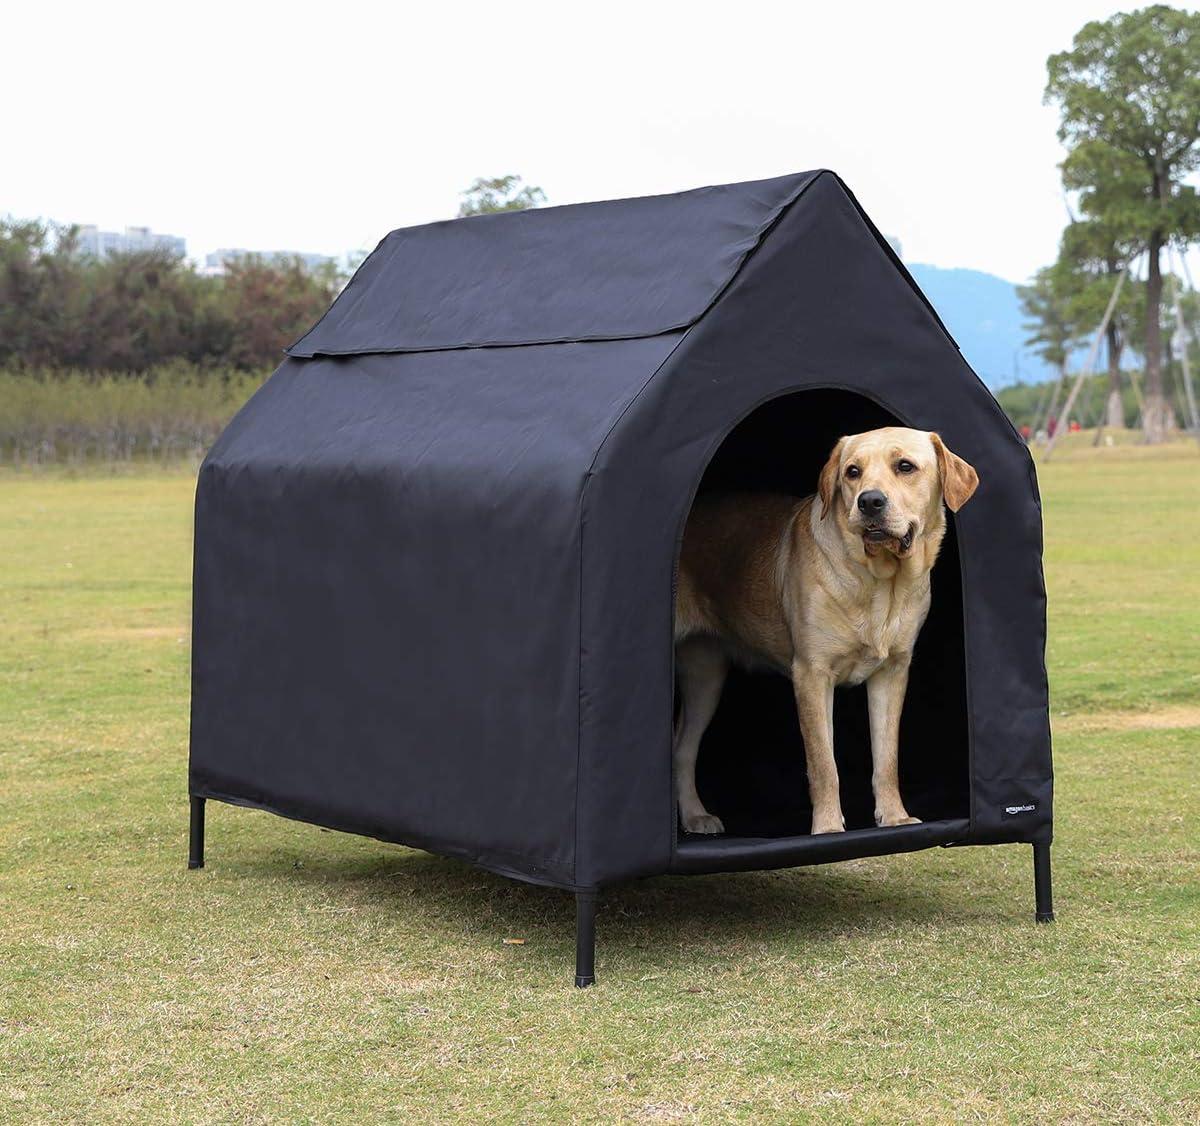 AmazonBasics - Caseta para mascotas, elevada, portátil, grande, negra